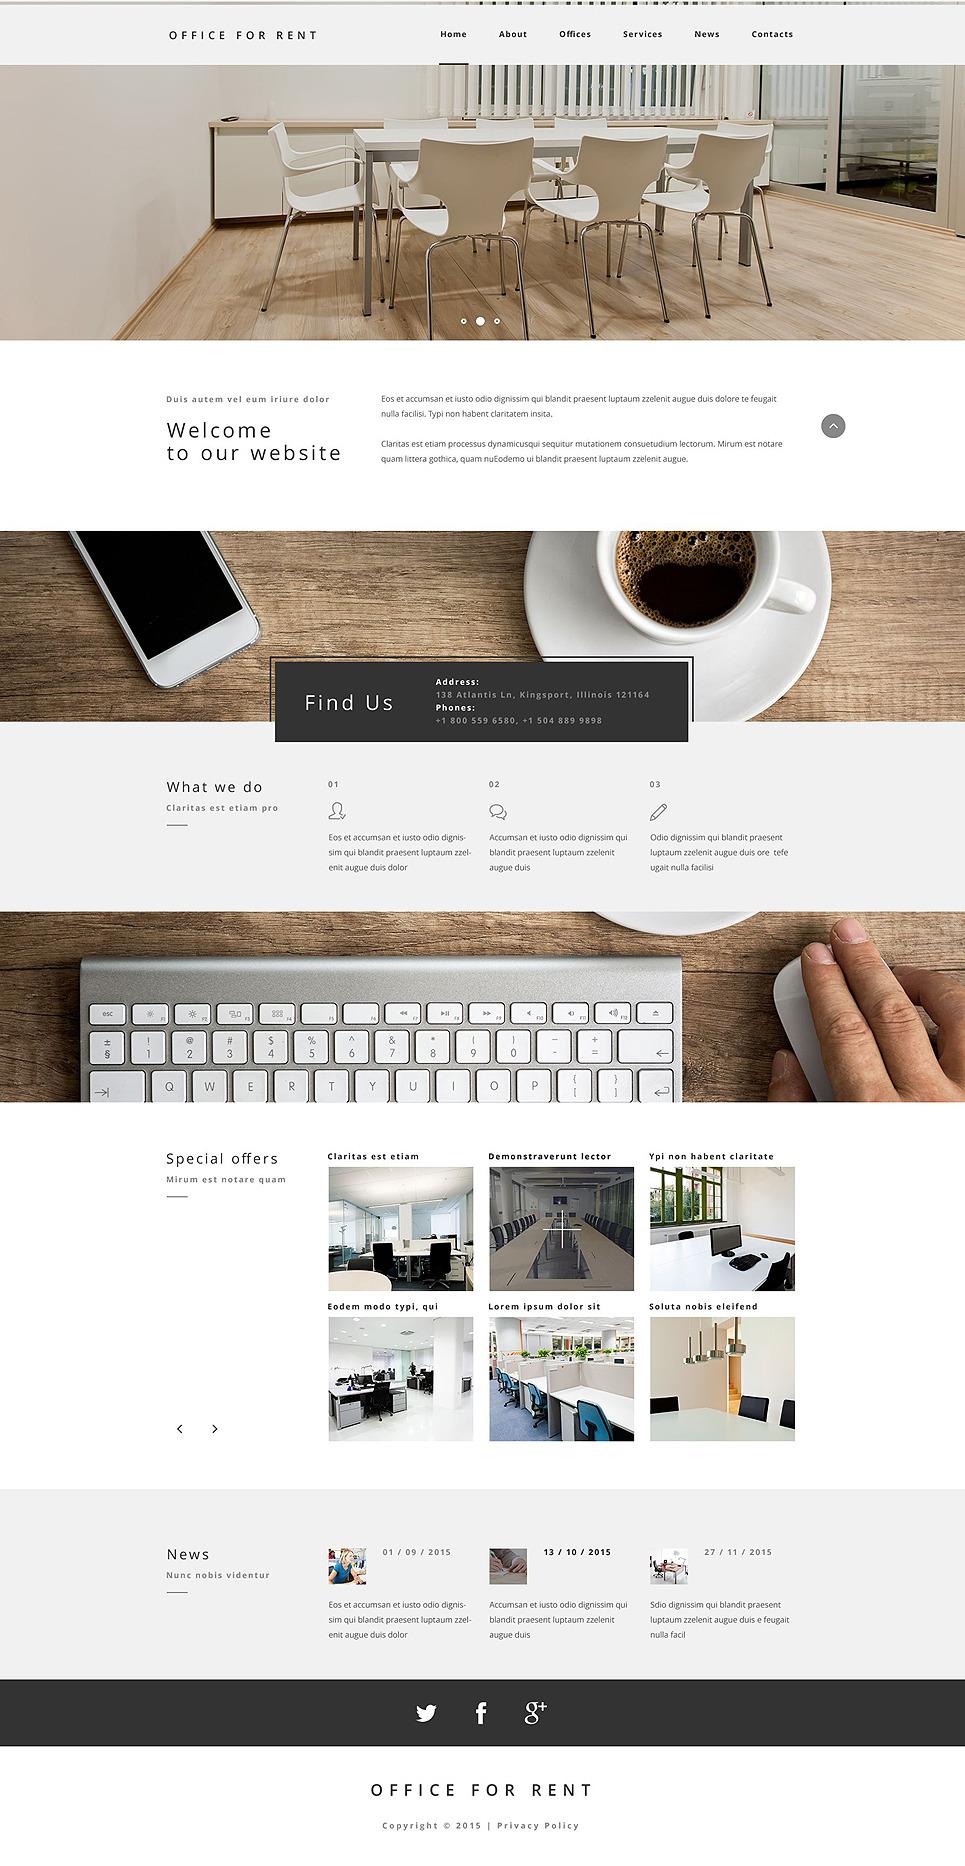 Office For Rent PSD Template New Screenshots BIG